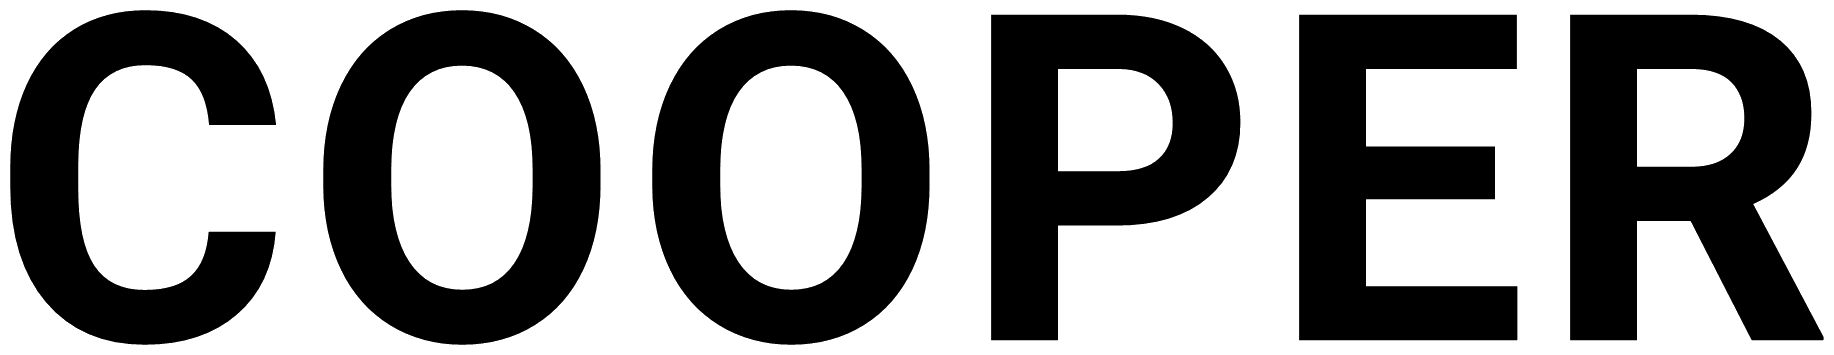 text CooperX logo